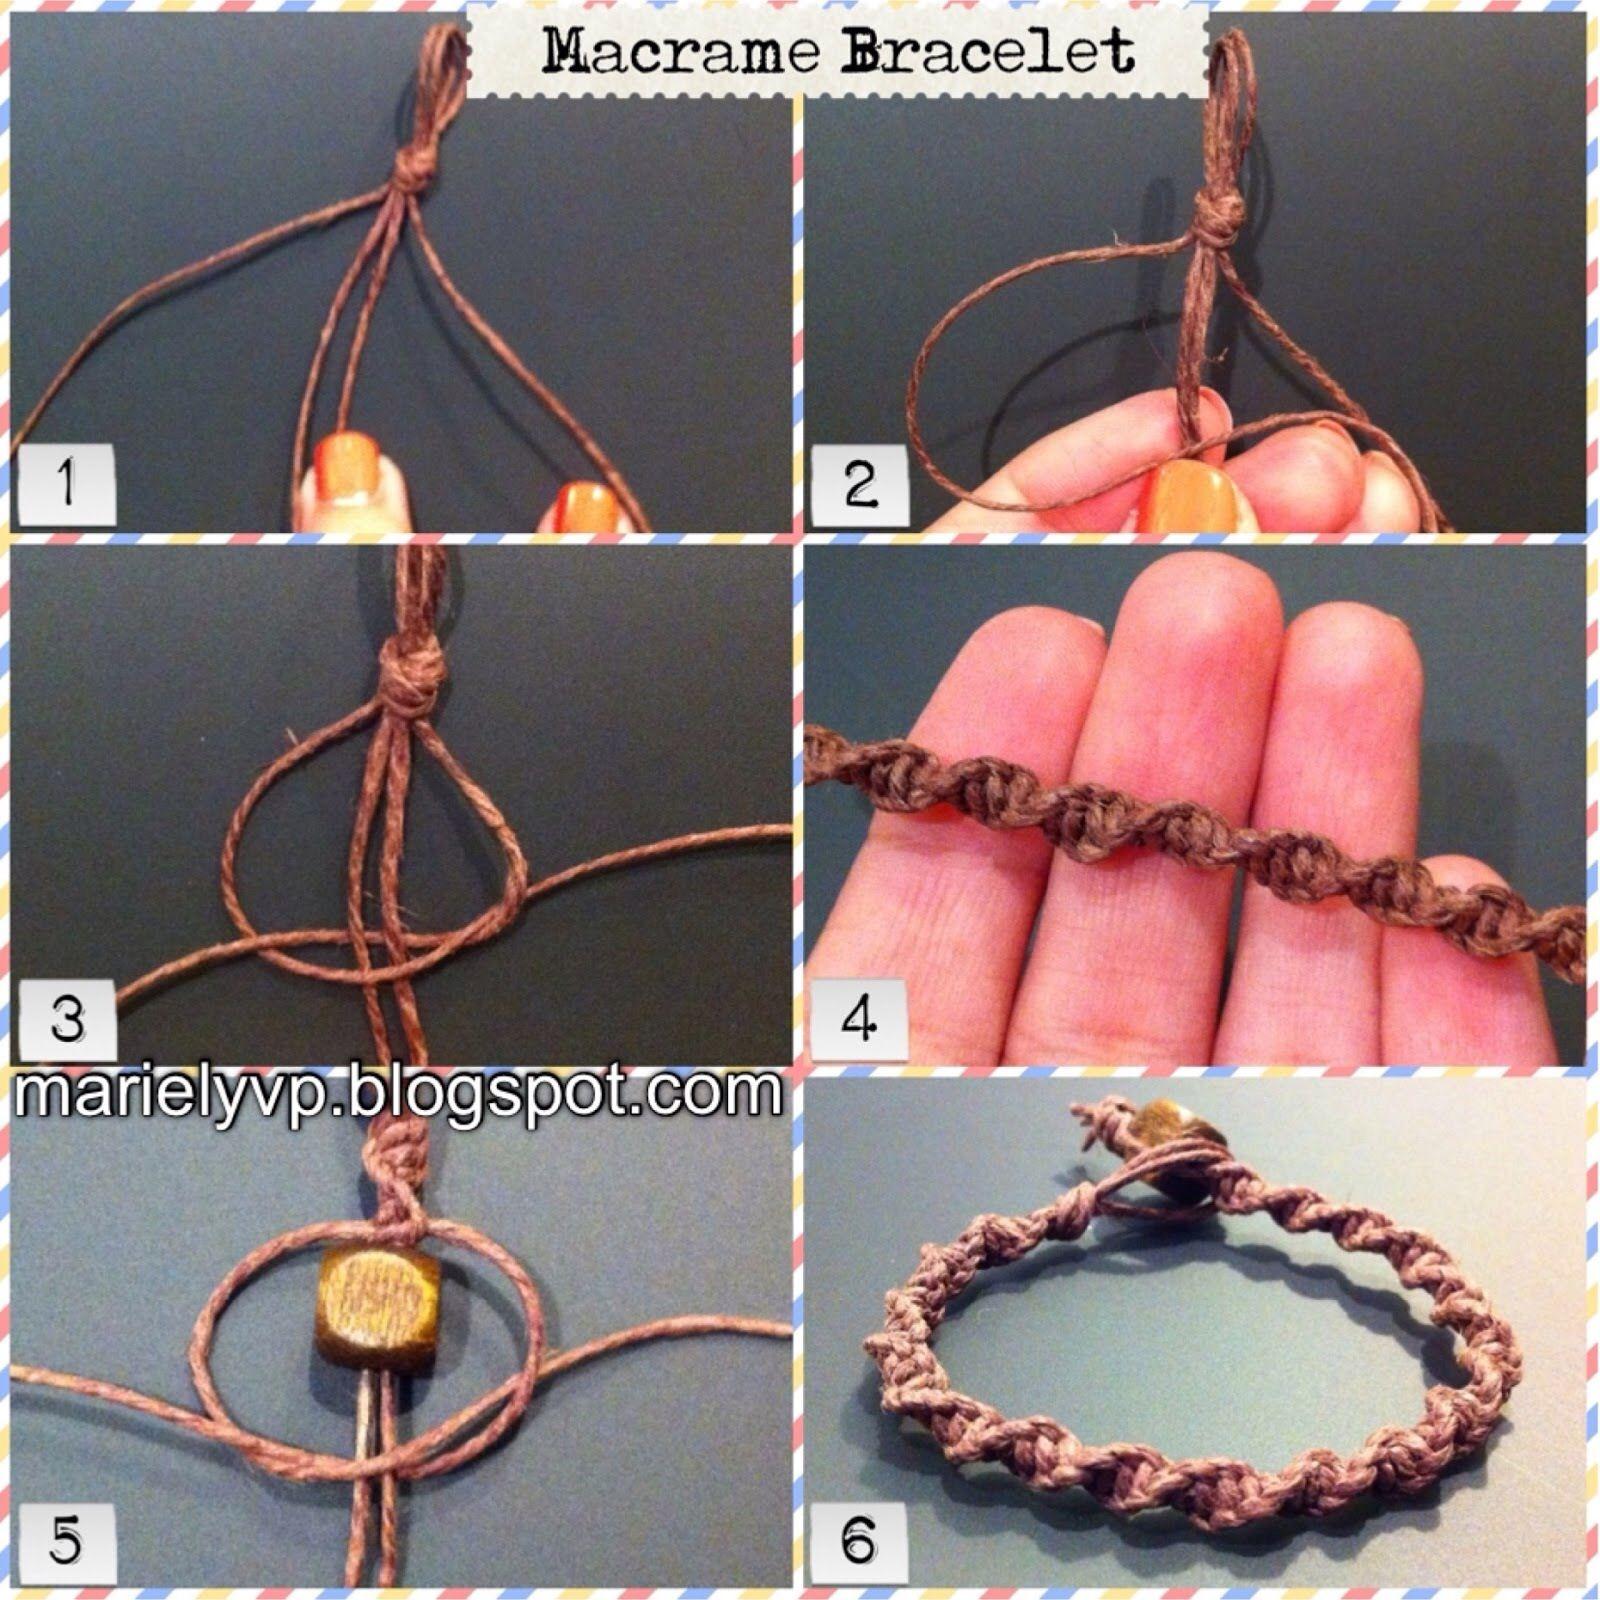 How to Make a Macrame Bracelet using square knots to make a spiral bracelet 62c5bf22b0b